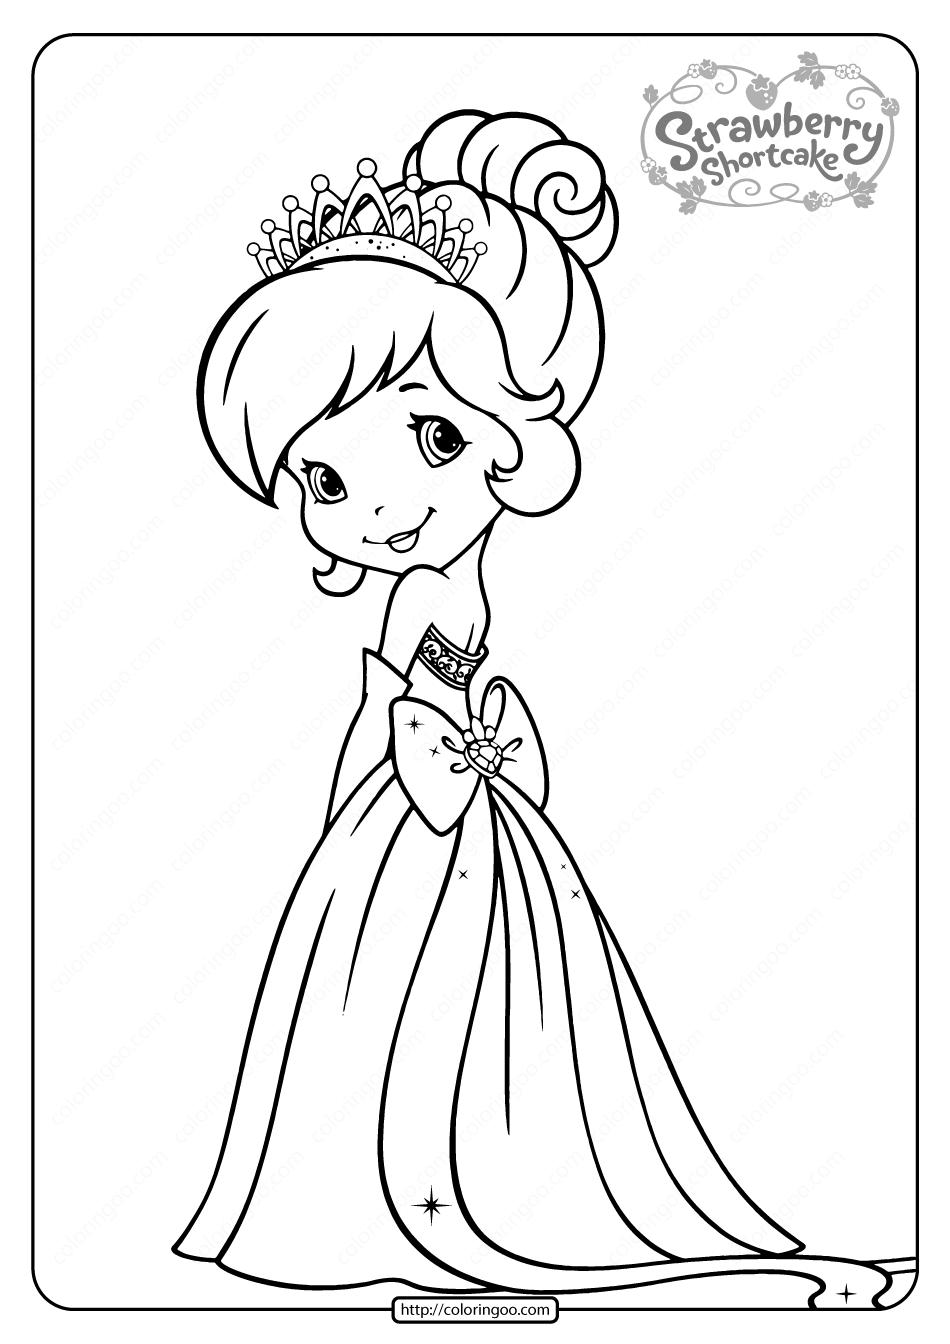 Free Printable Strawberry Shortcake Coloring Page 06 In 2020 Princess Coloring Pages Strawberry Shortcake Coloring Pages Coloring Pages